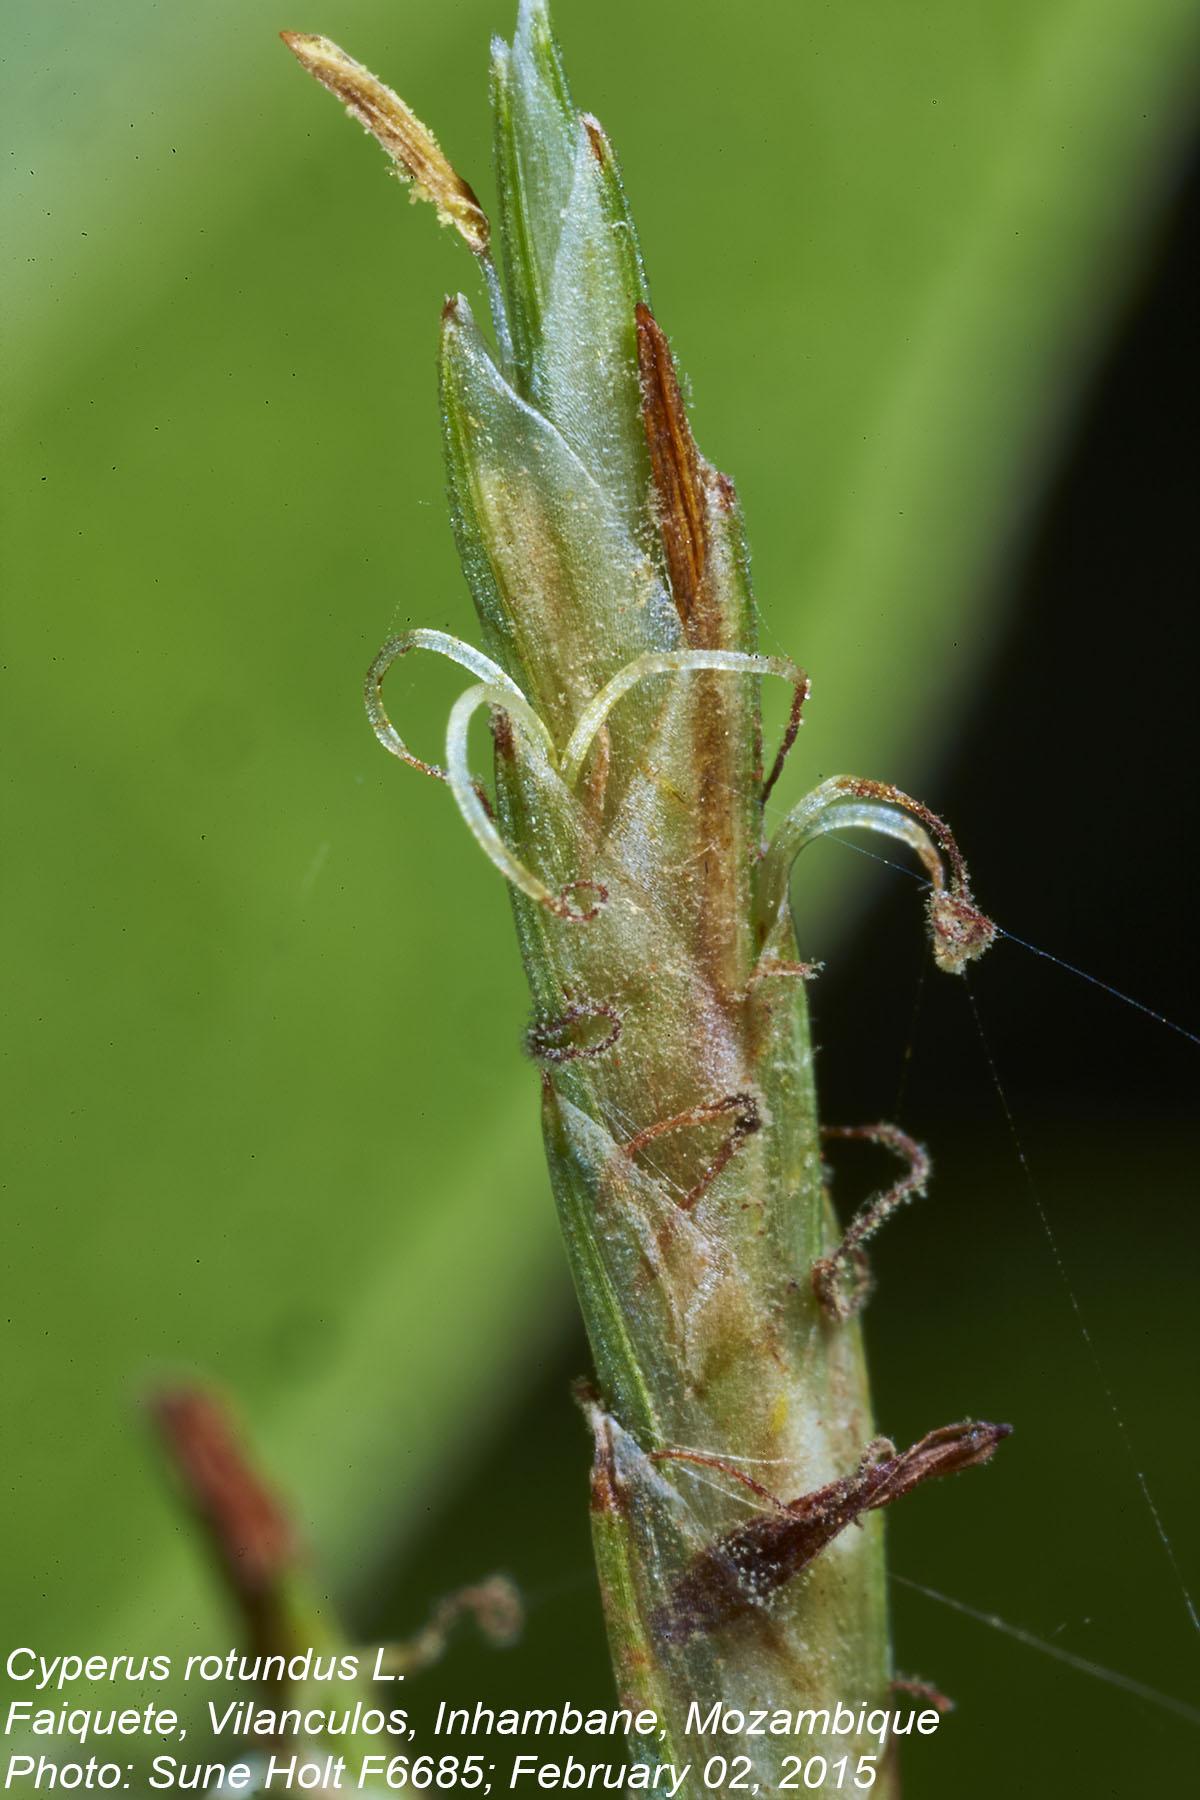 Cyperus rotundus